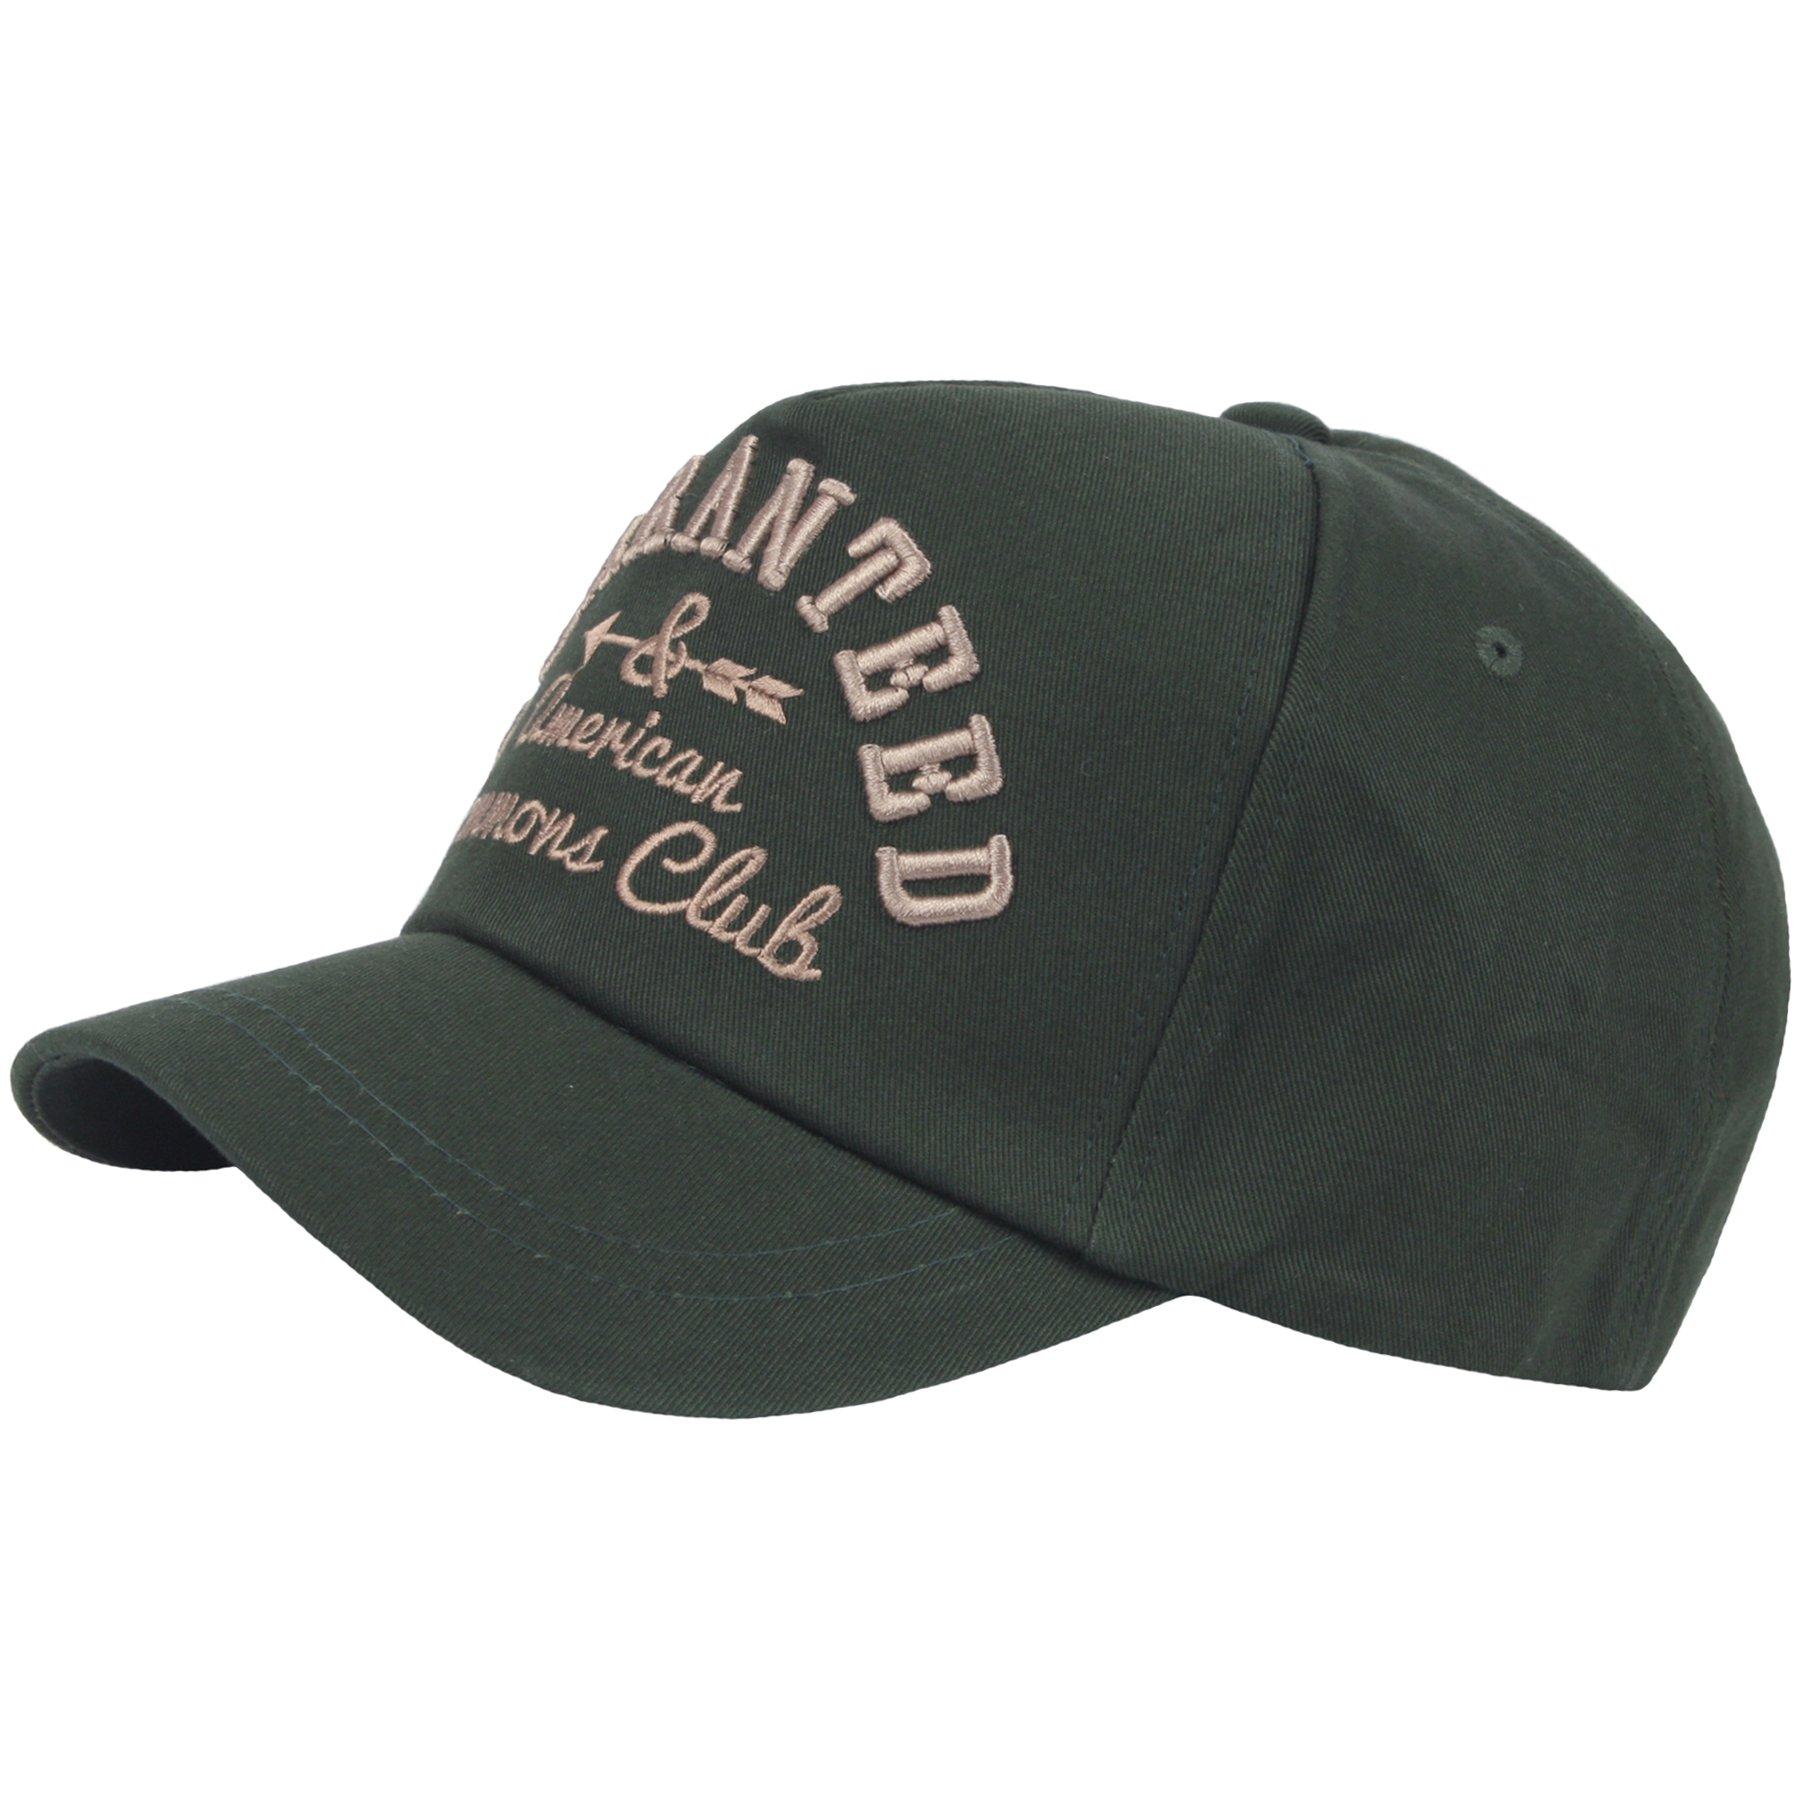 RaOn B340 Embroidered Logo Short Bill Design Club Cute Ball Cap Baseball Hat Truckers (Green)